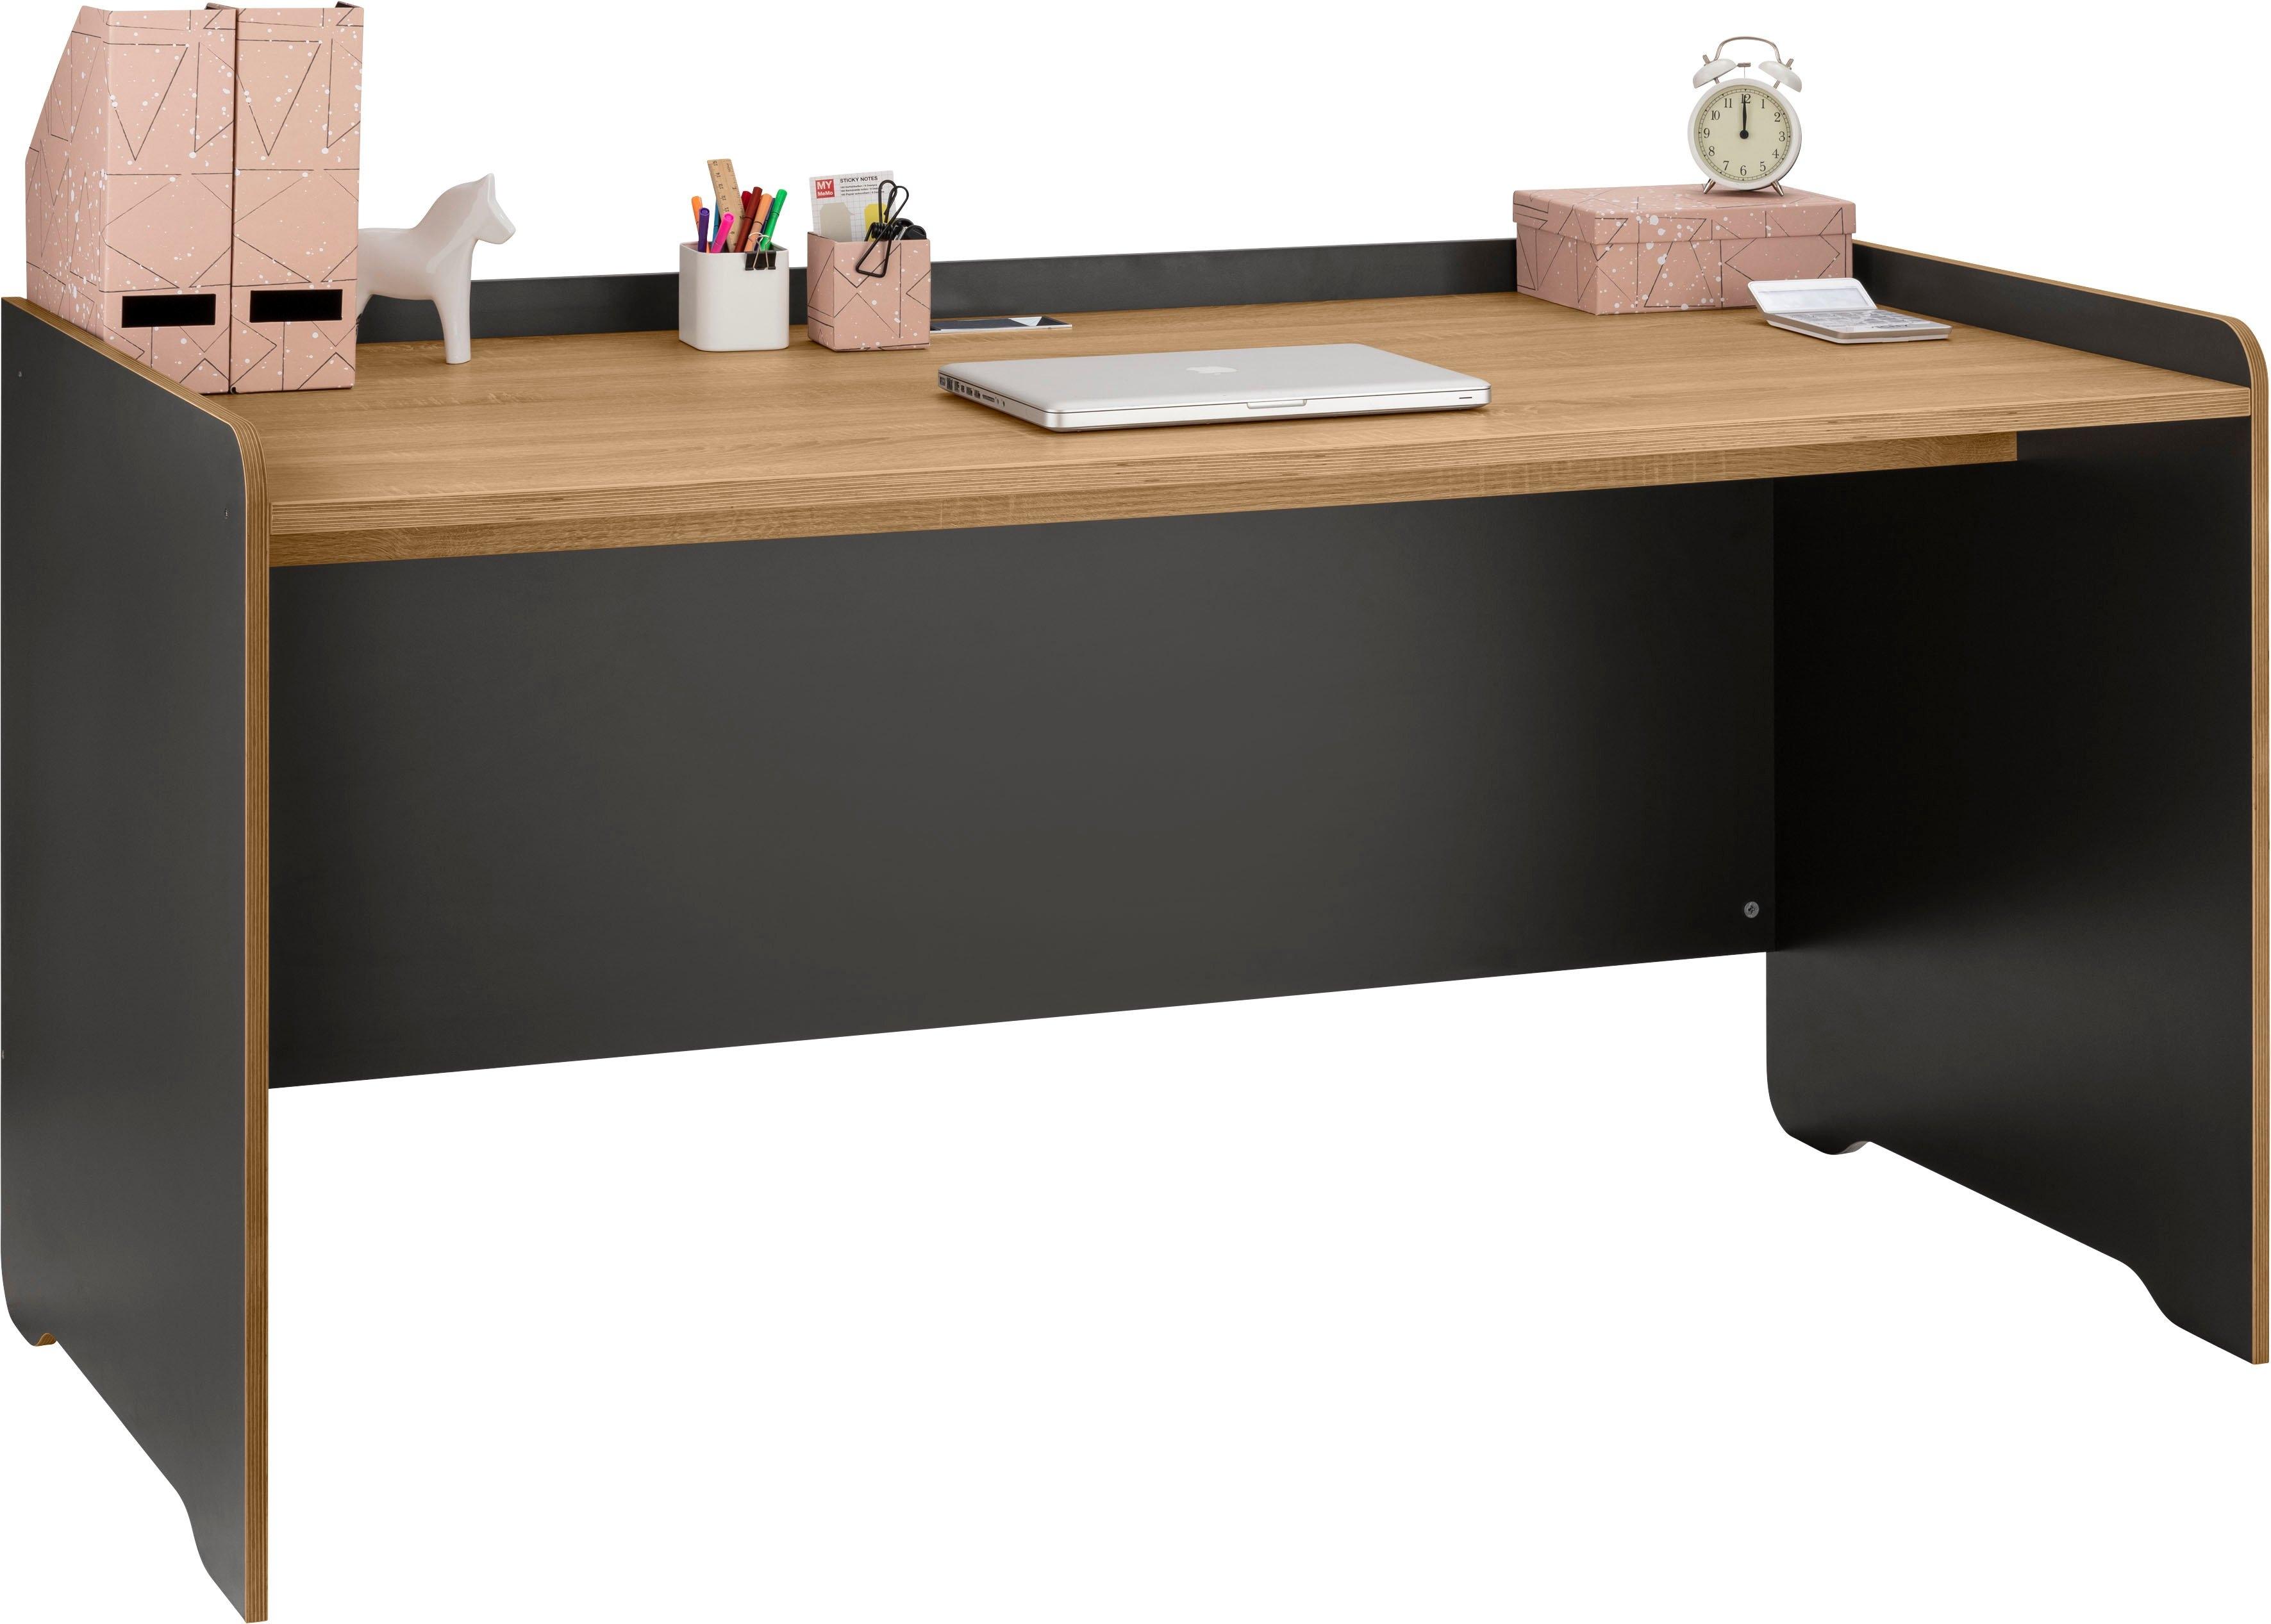 Places of Style bureau »Ergil« - verschillende betaalmethodes